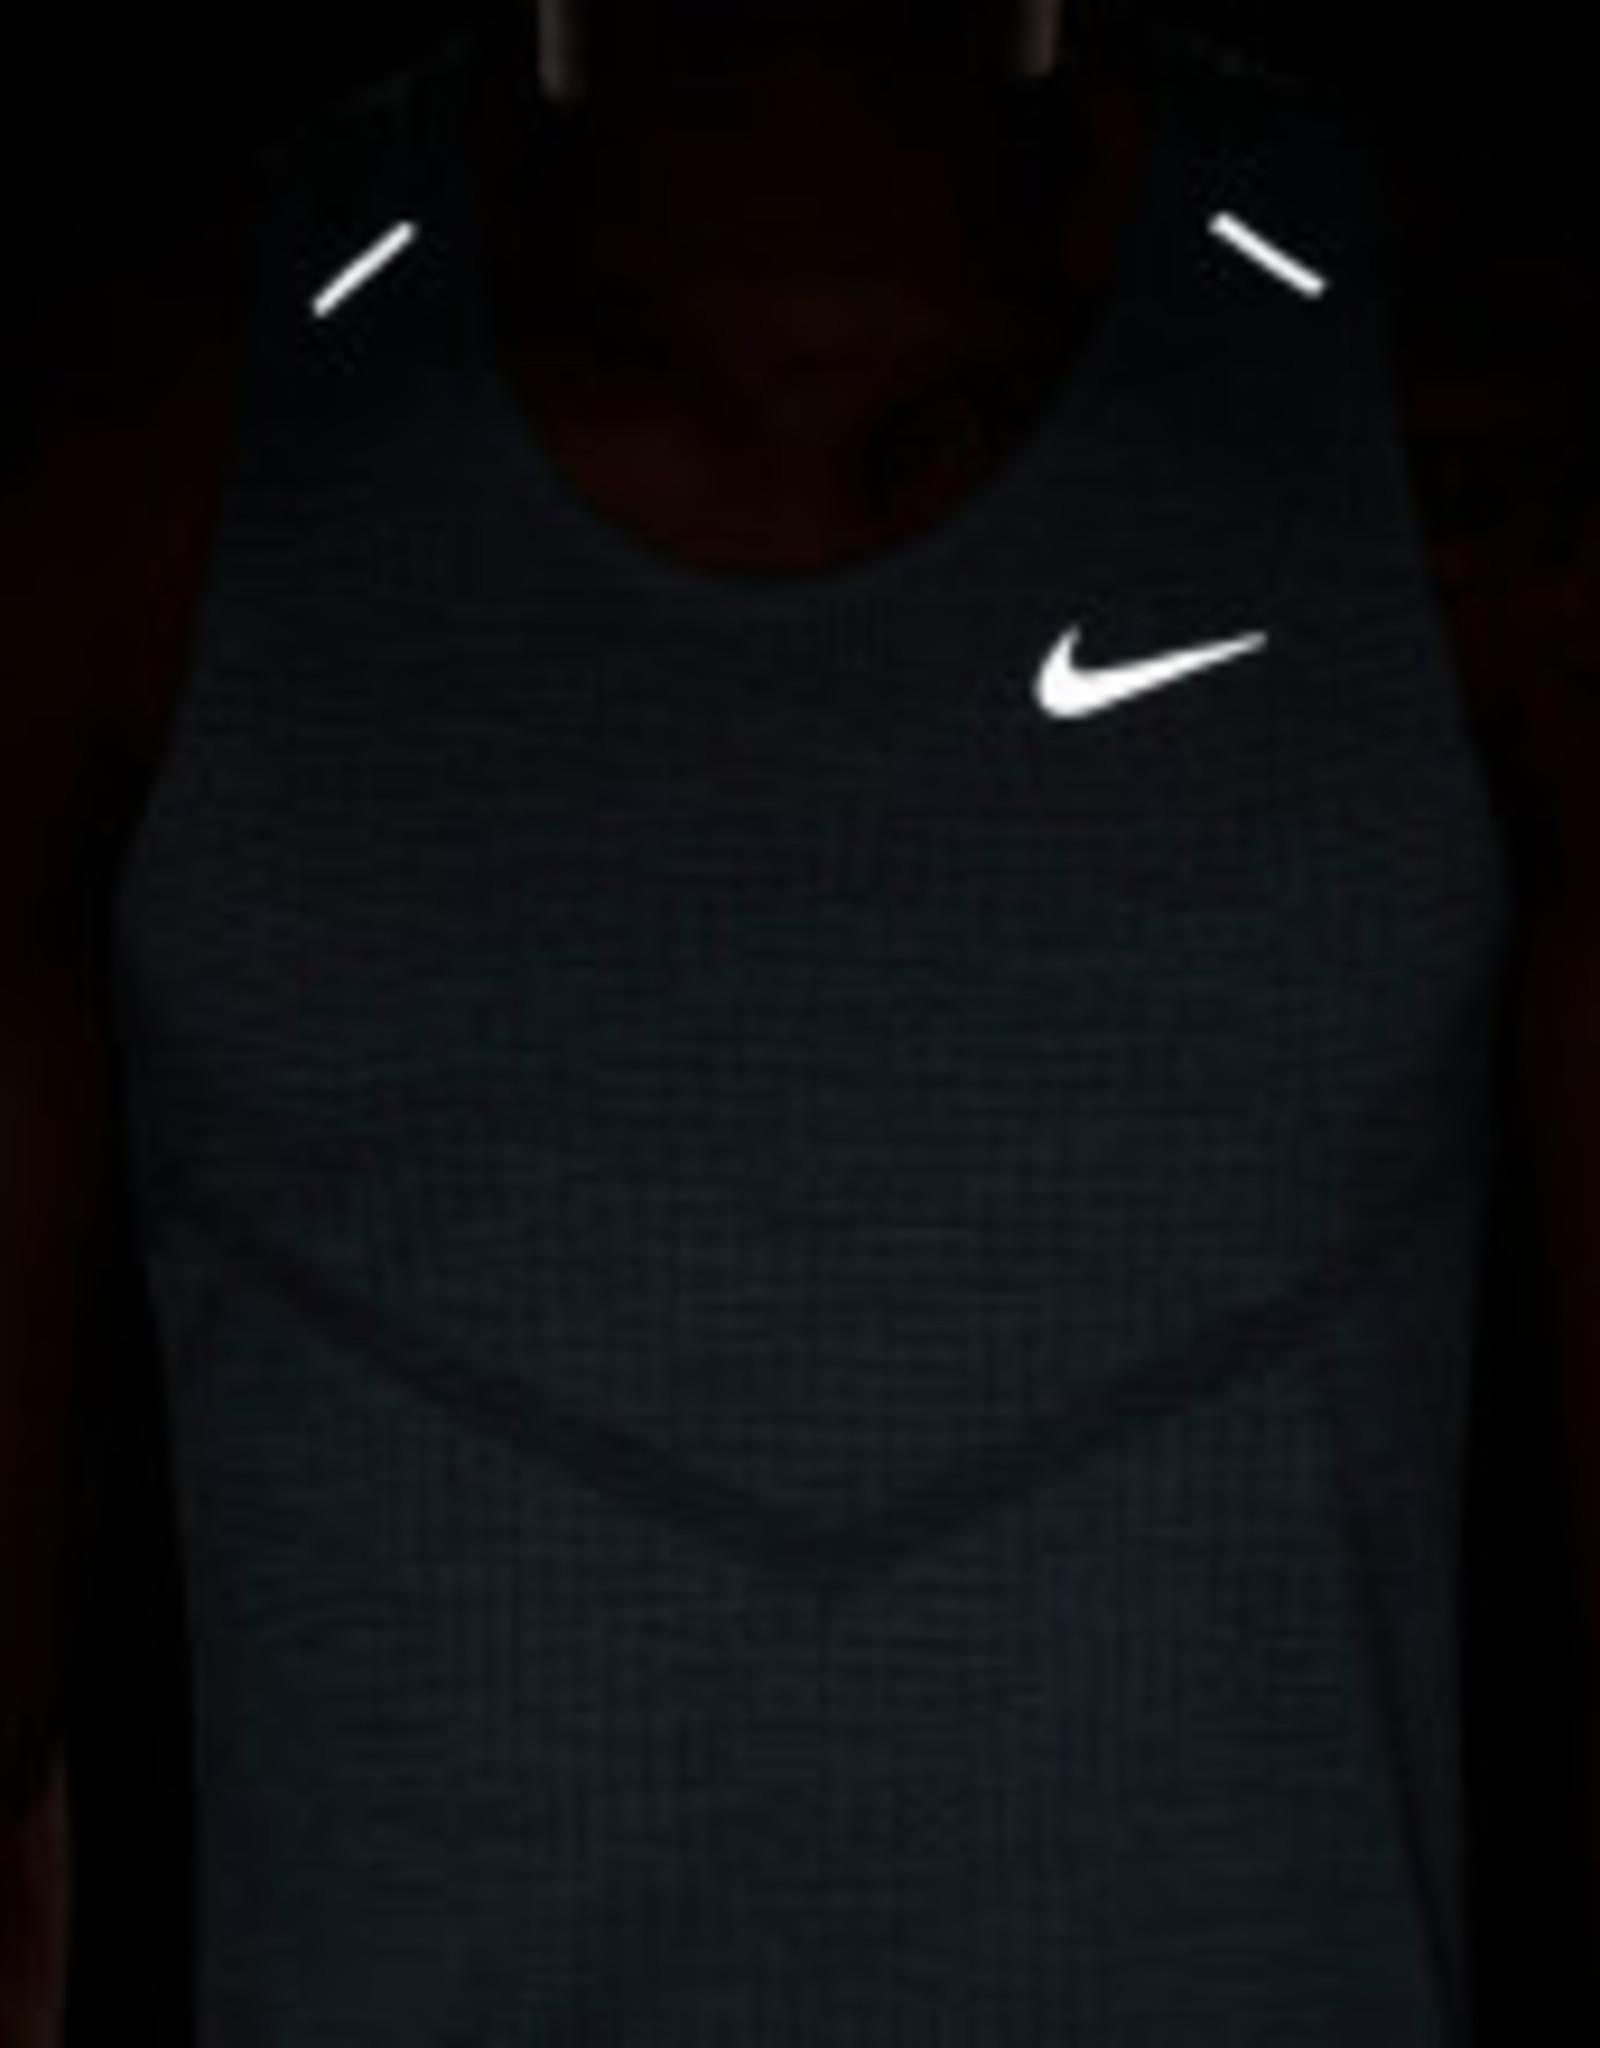 NIKE Nike Dri-FIT ADV Techknit Ultra CZ9192-387